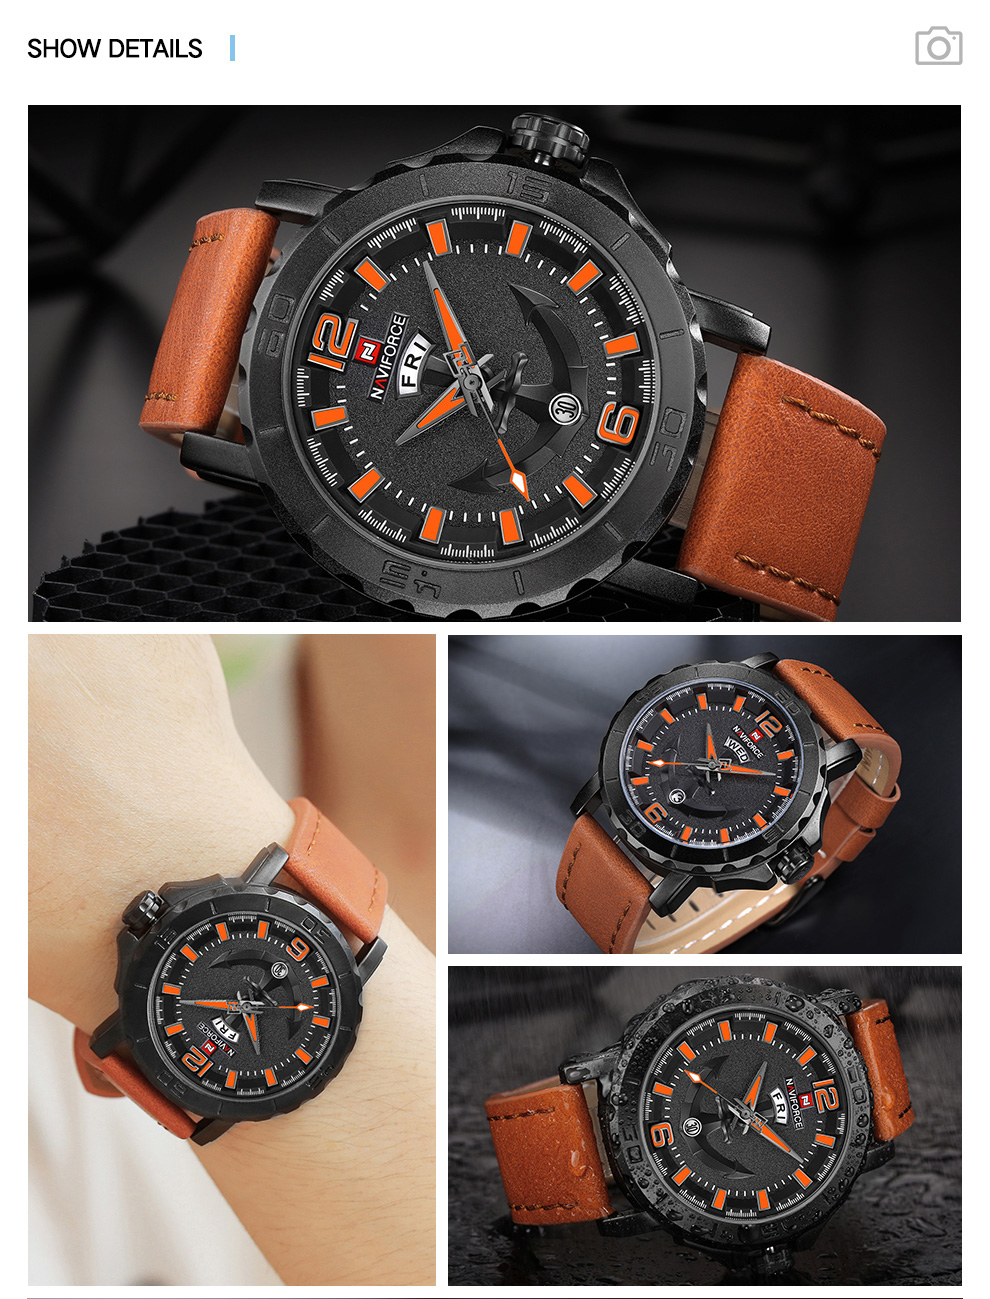 H4a9a838843ec45b5bfb35ac856d98cf5I Top Luxury Brand NAVIFORCE Mens Sport Watches Casual Leather Strap Waterproof Military Quartz WristWatch Clock Male Reloj Hombre